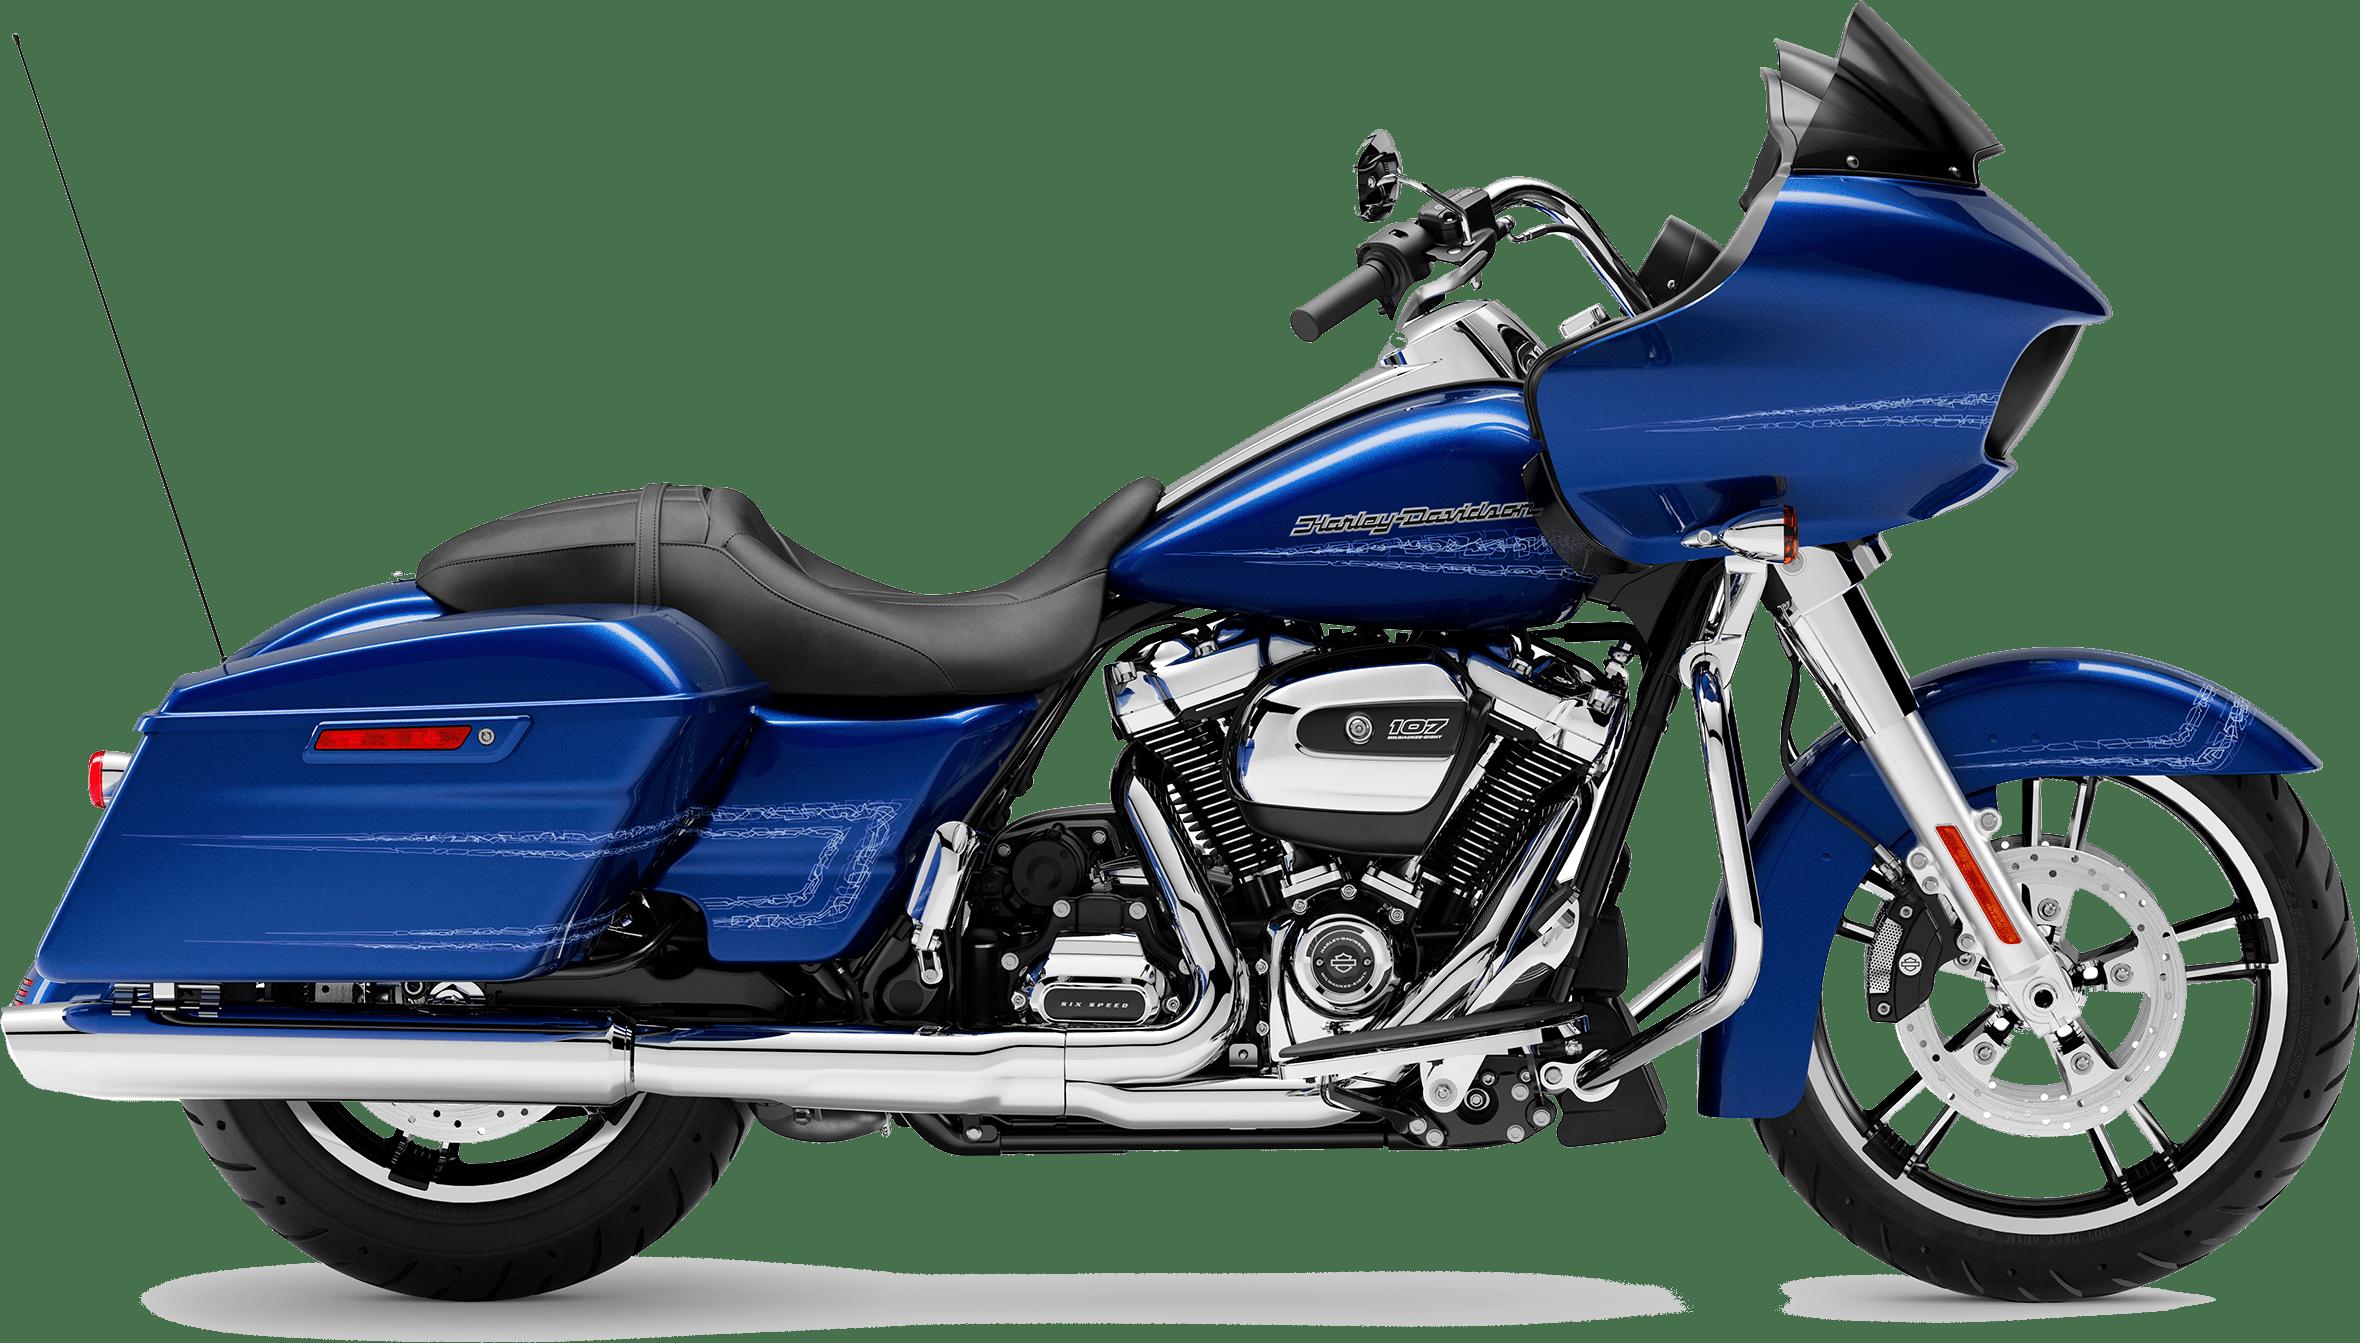 2019 Harley-Davidson H-D Touring Road Glide Blue Max